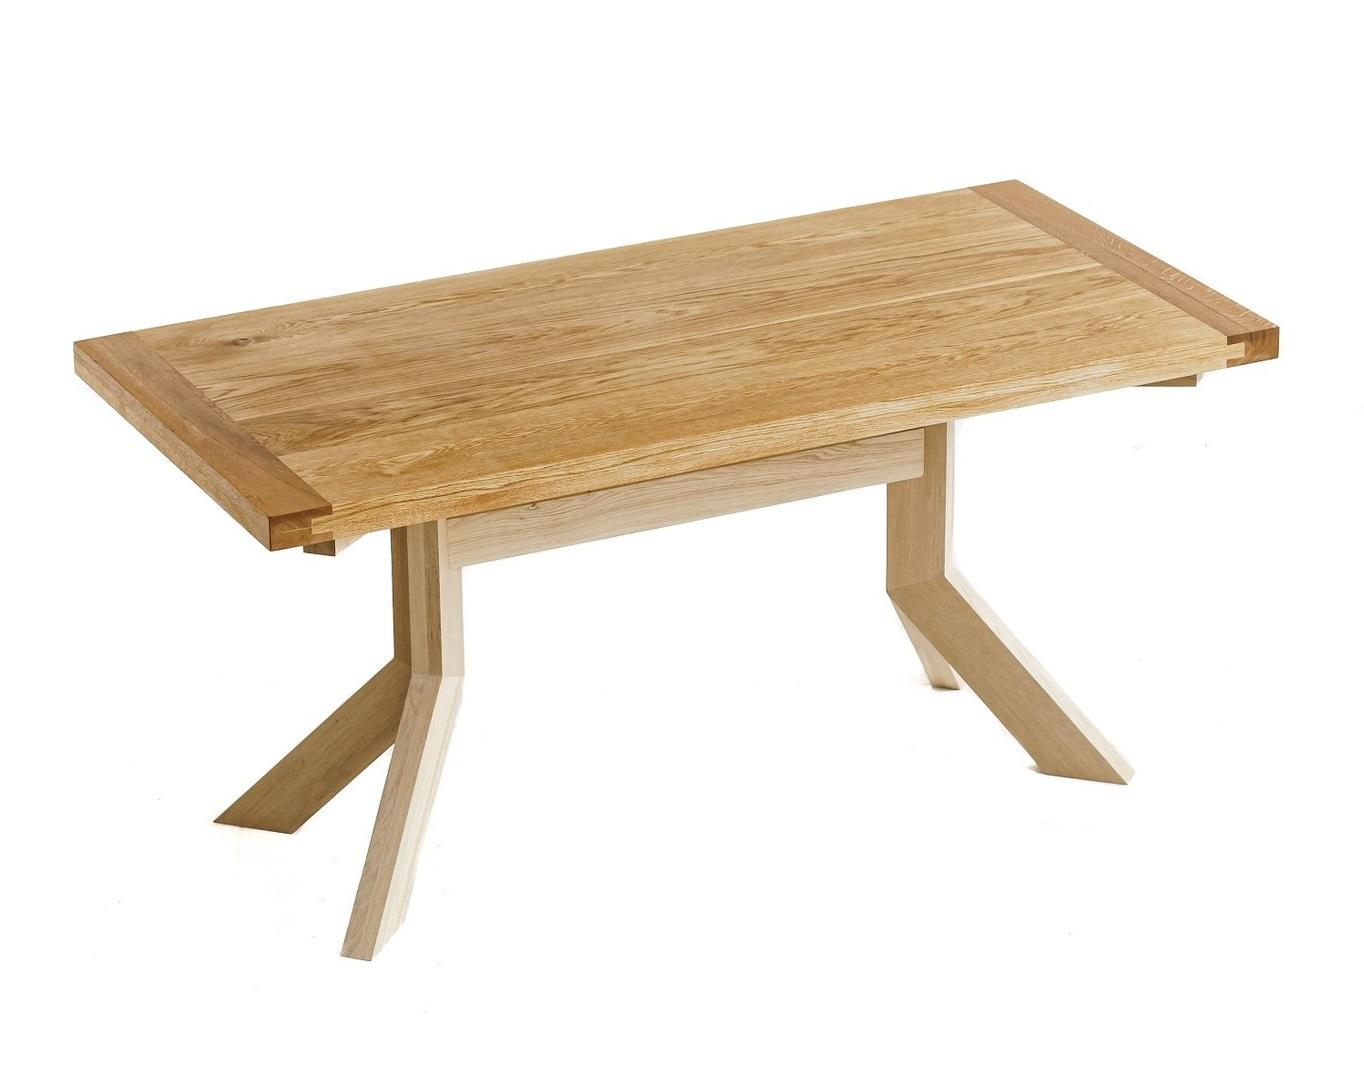 Обеденный стол (woodzpro) коричневый 77x75x160 см.